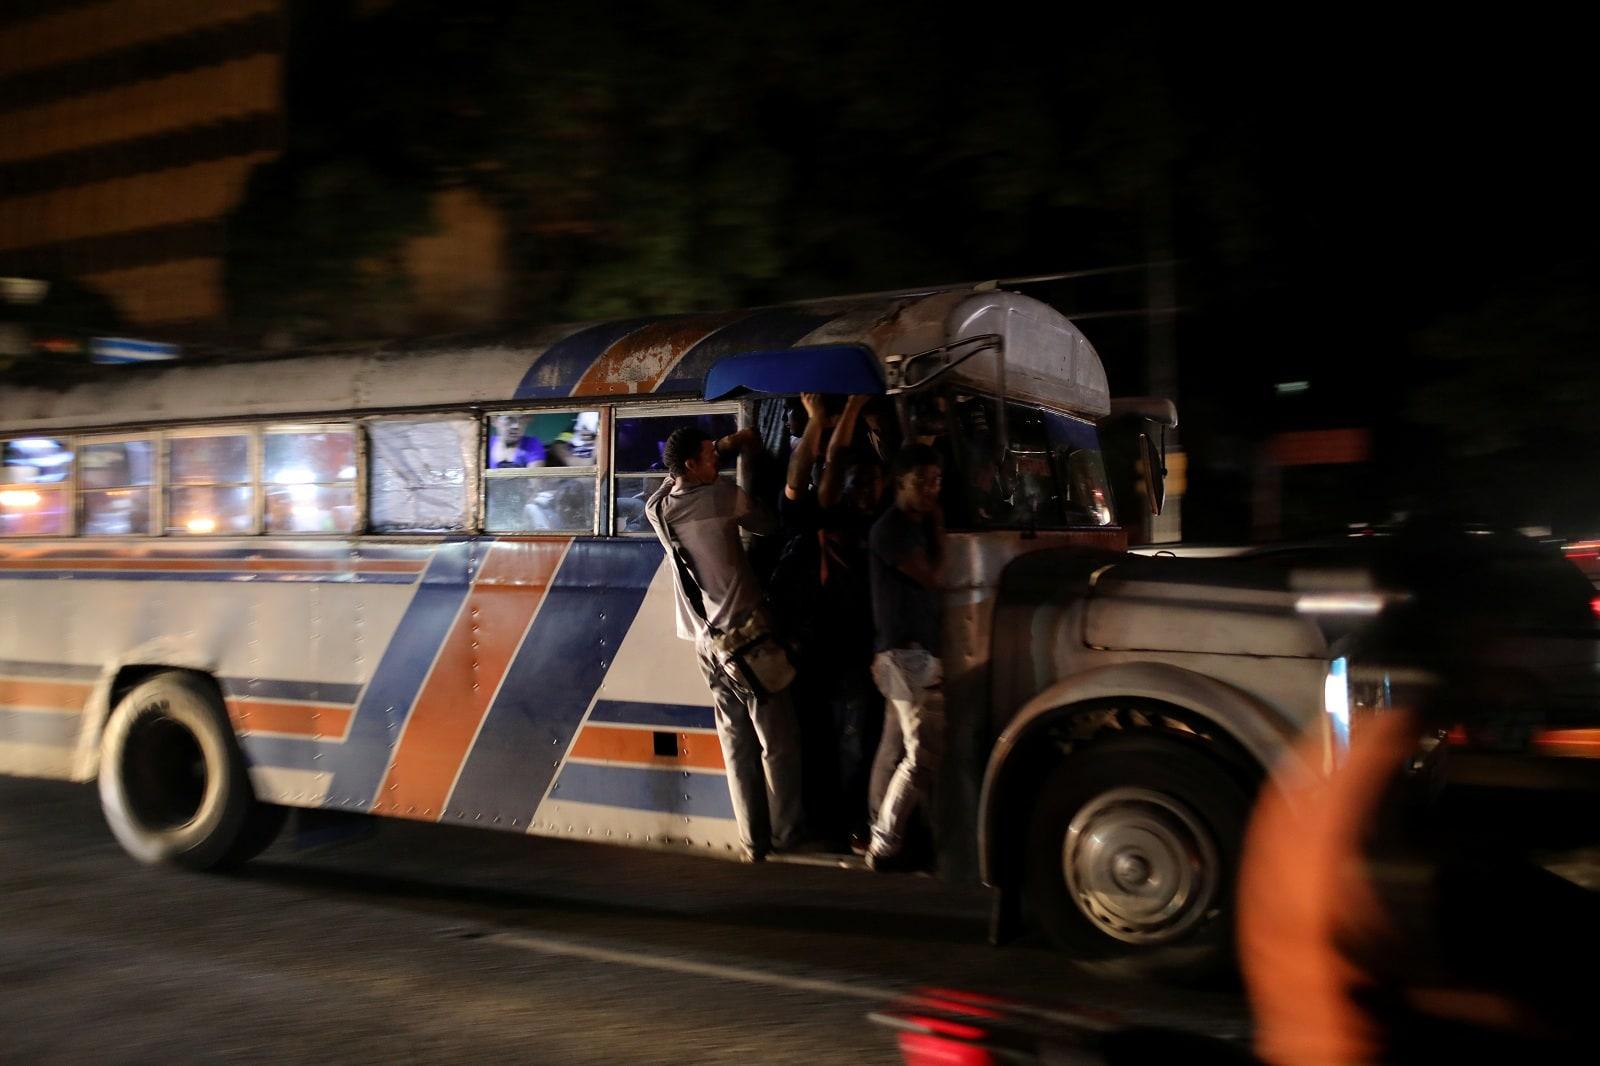 People ride in a bus during a blackout in Caracas in Caracas, Venezuela July 22, 2019. REUTERS/Manaure Quintero